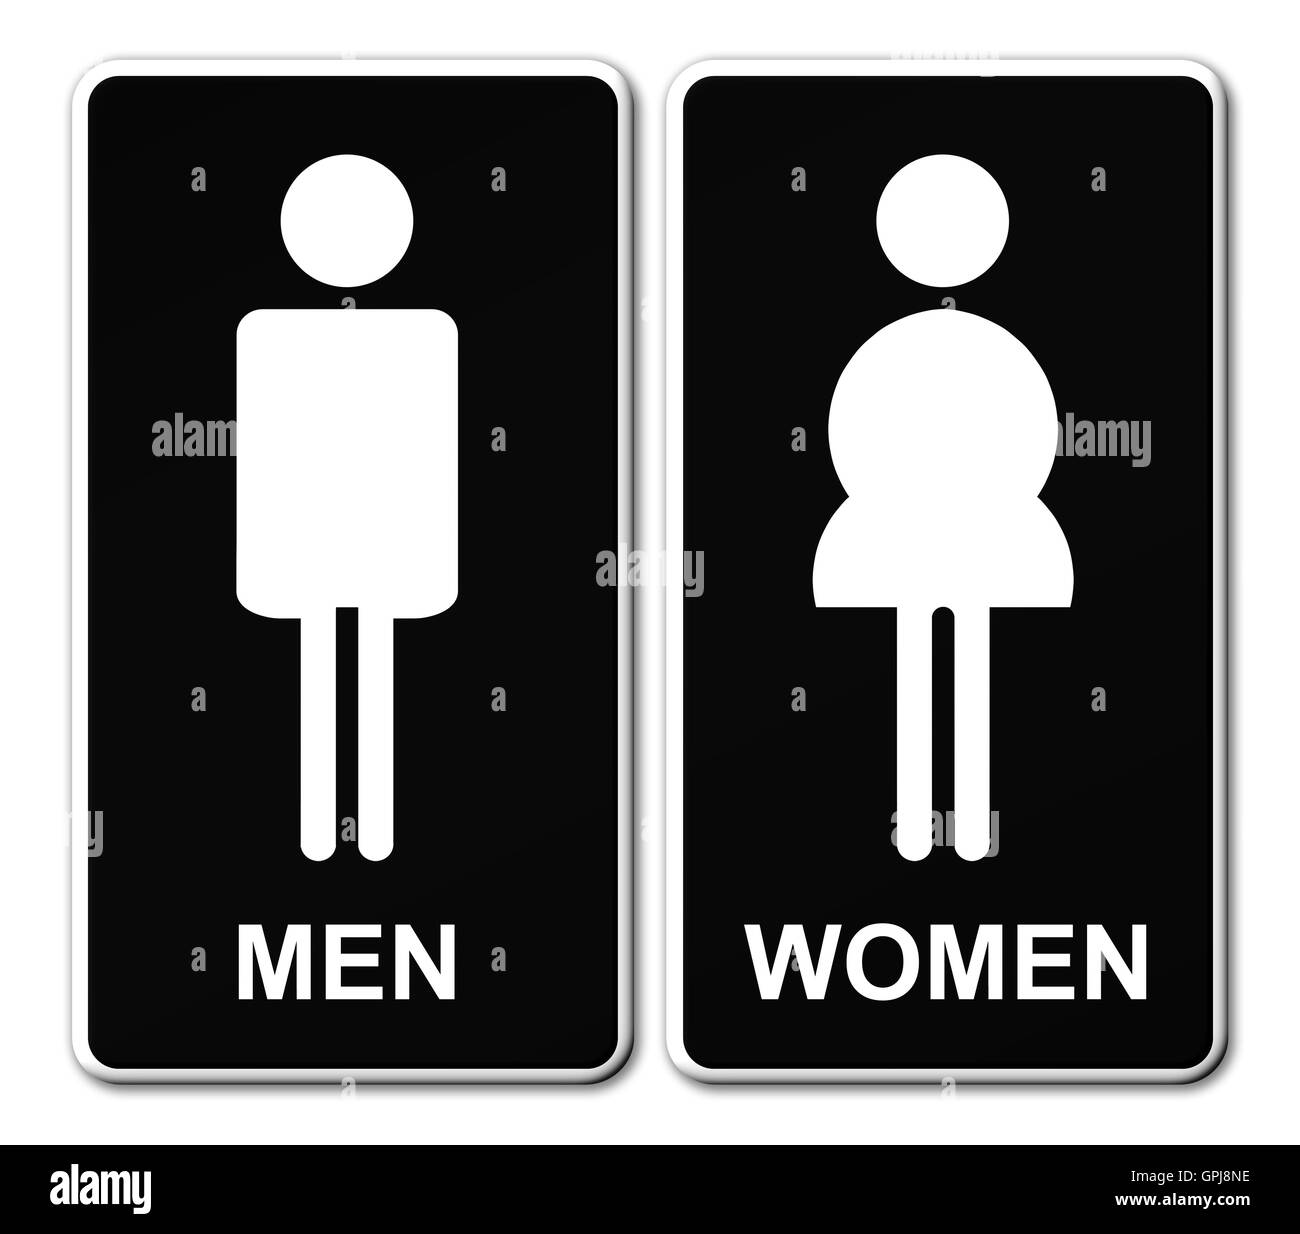 man woman restroom sign stock photo 117186650 alamy